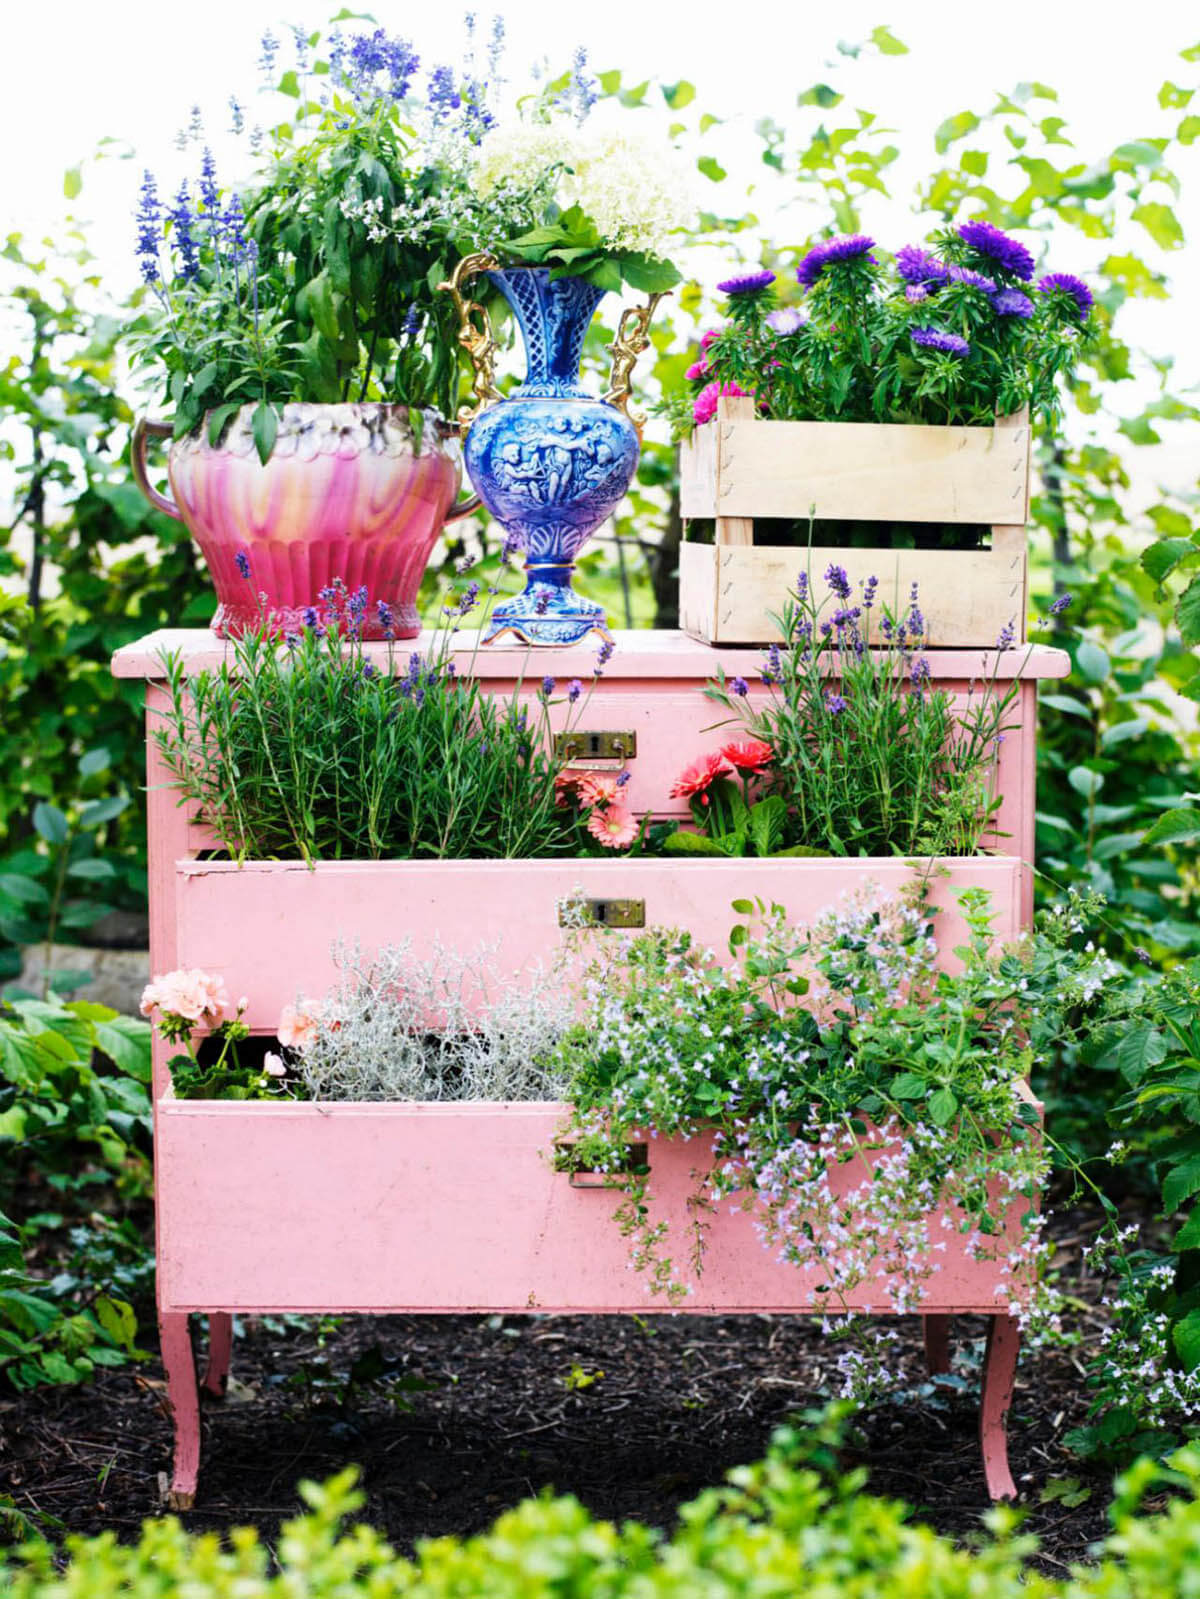 34 Best Vintage Garden Decor Ideas and Designs for 2020 on Garden Decor Ideas  id=11146